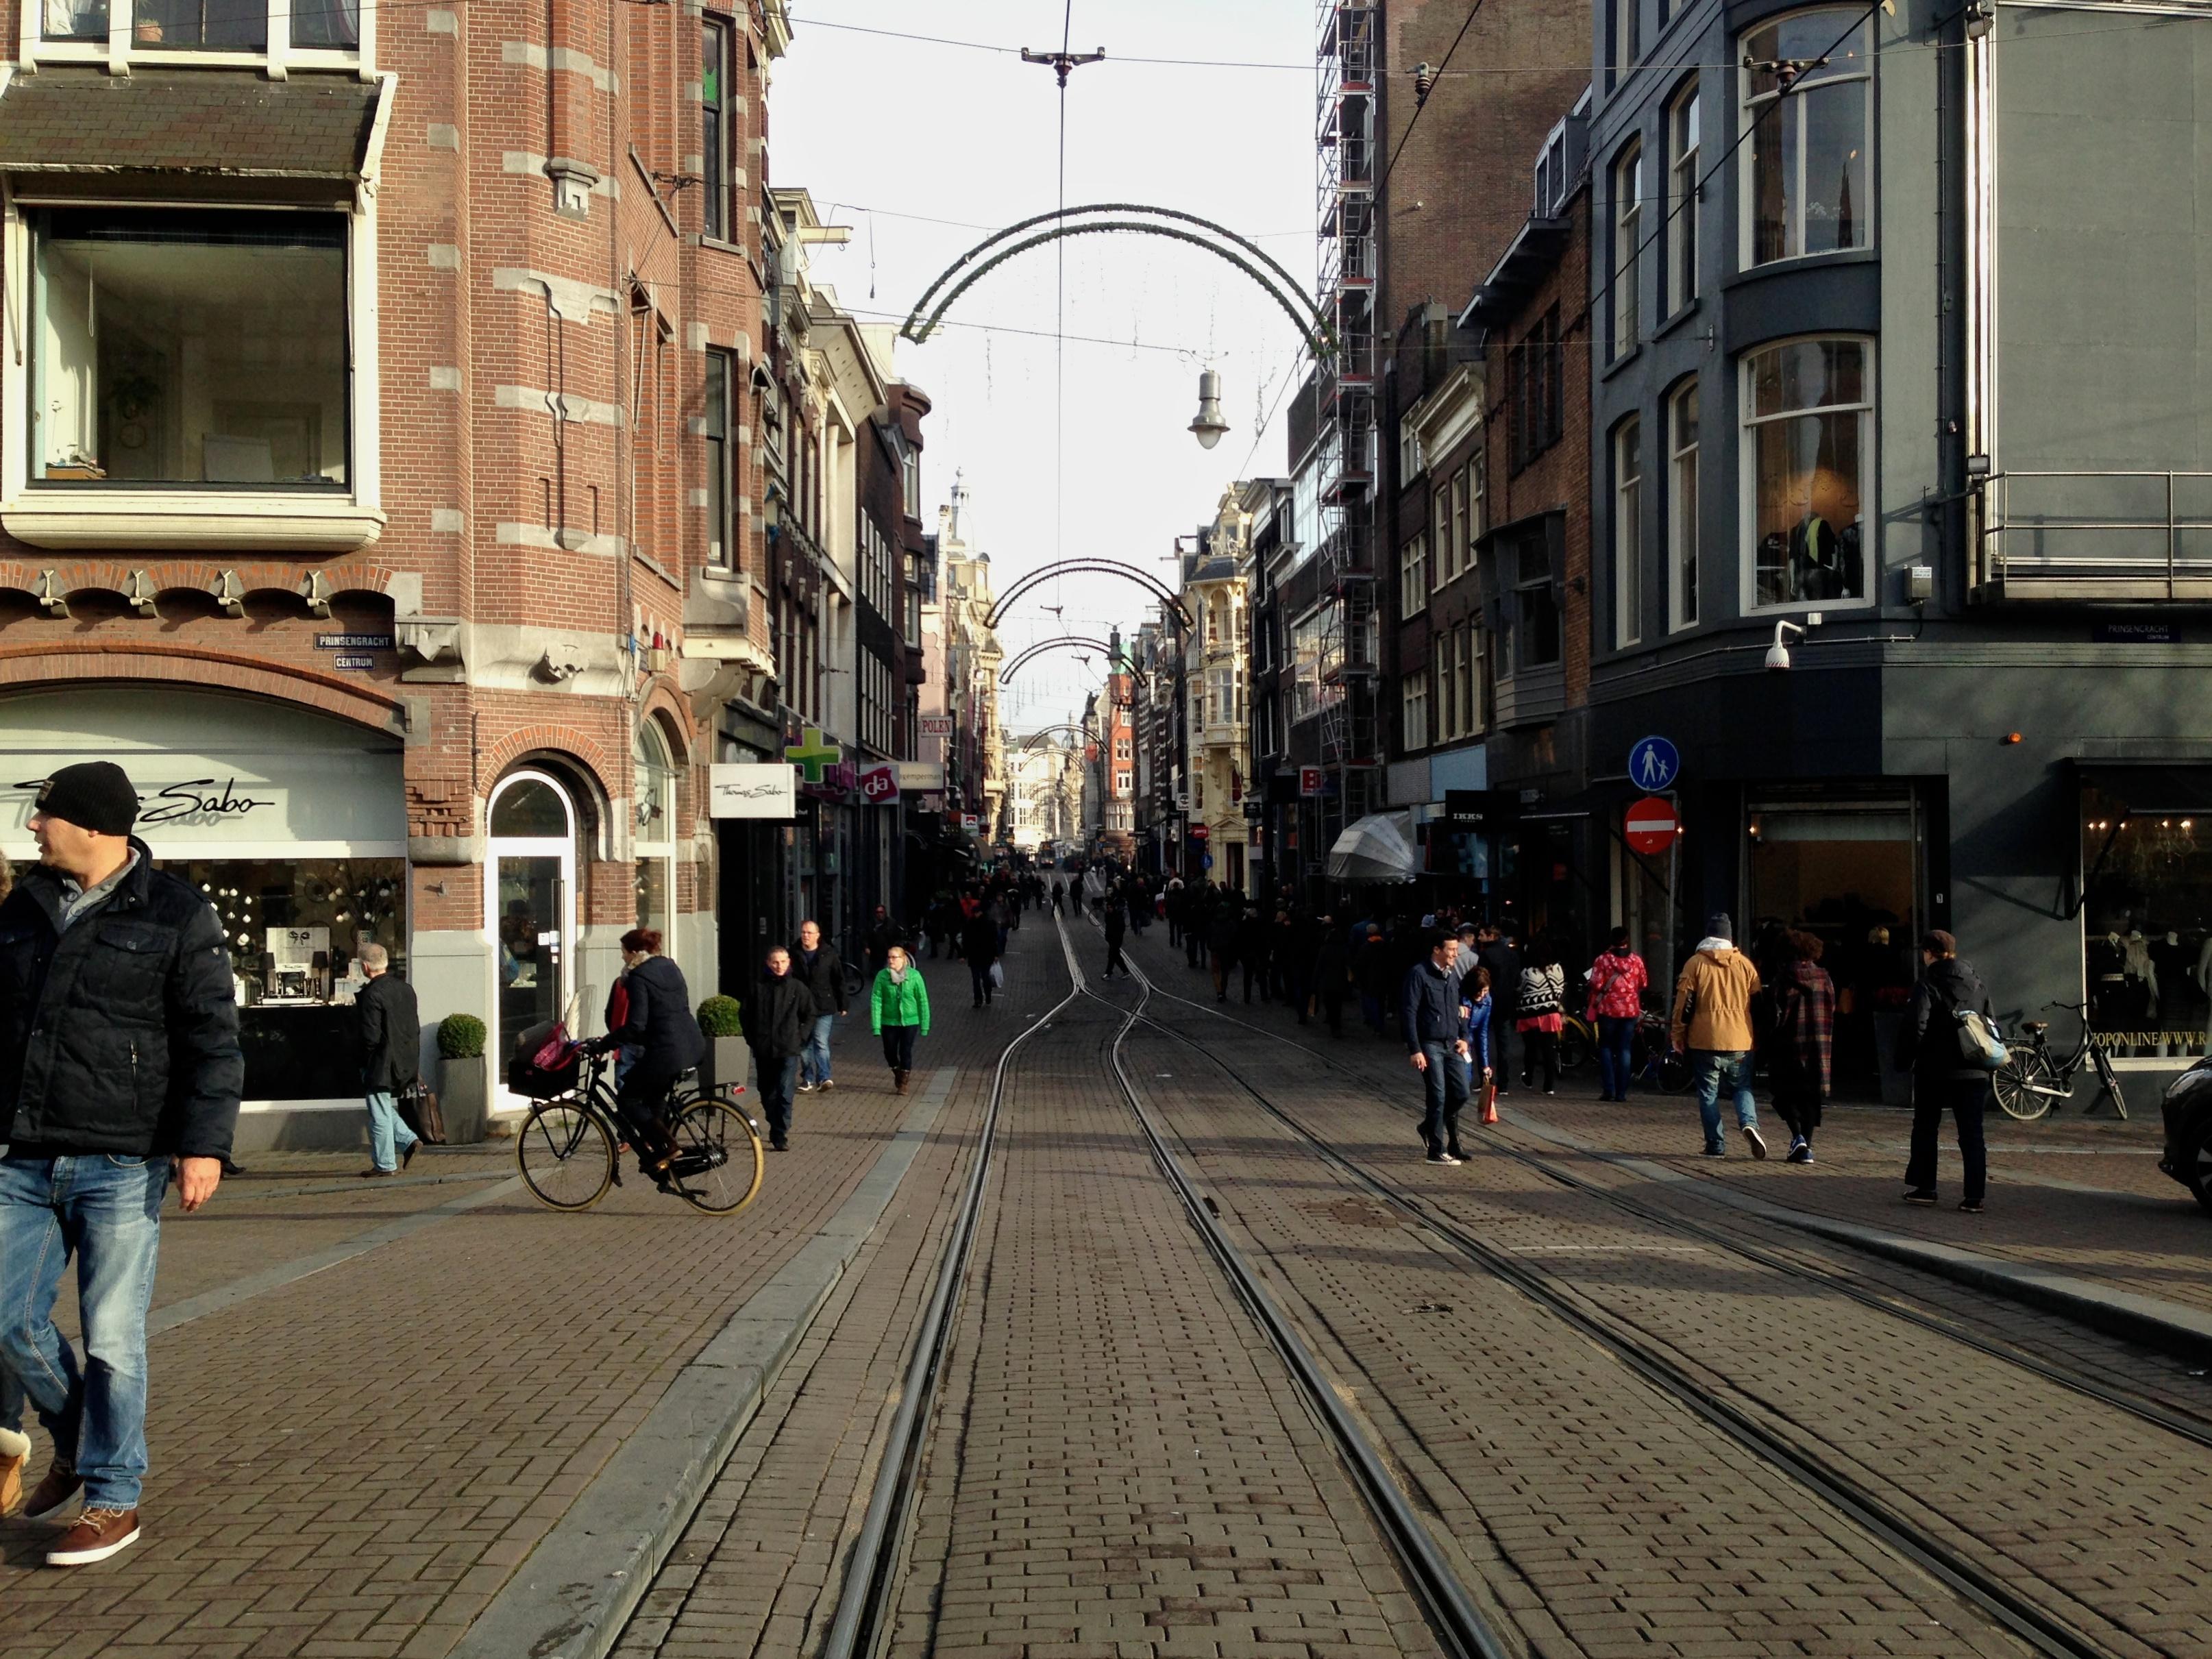 Walking down the street - 5 1